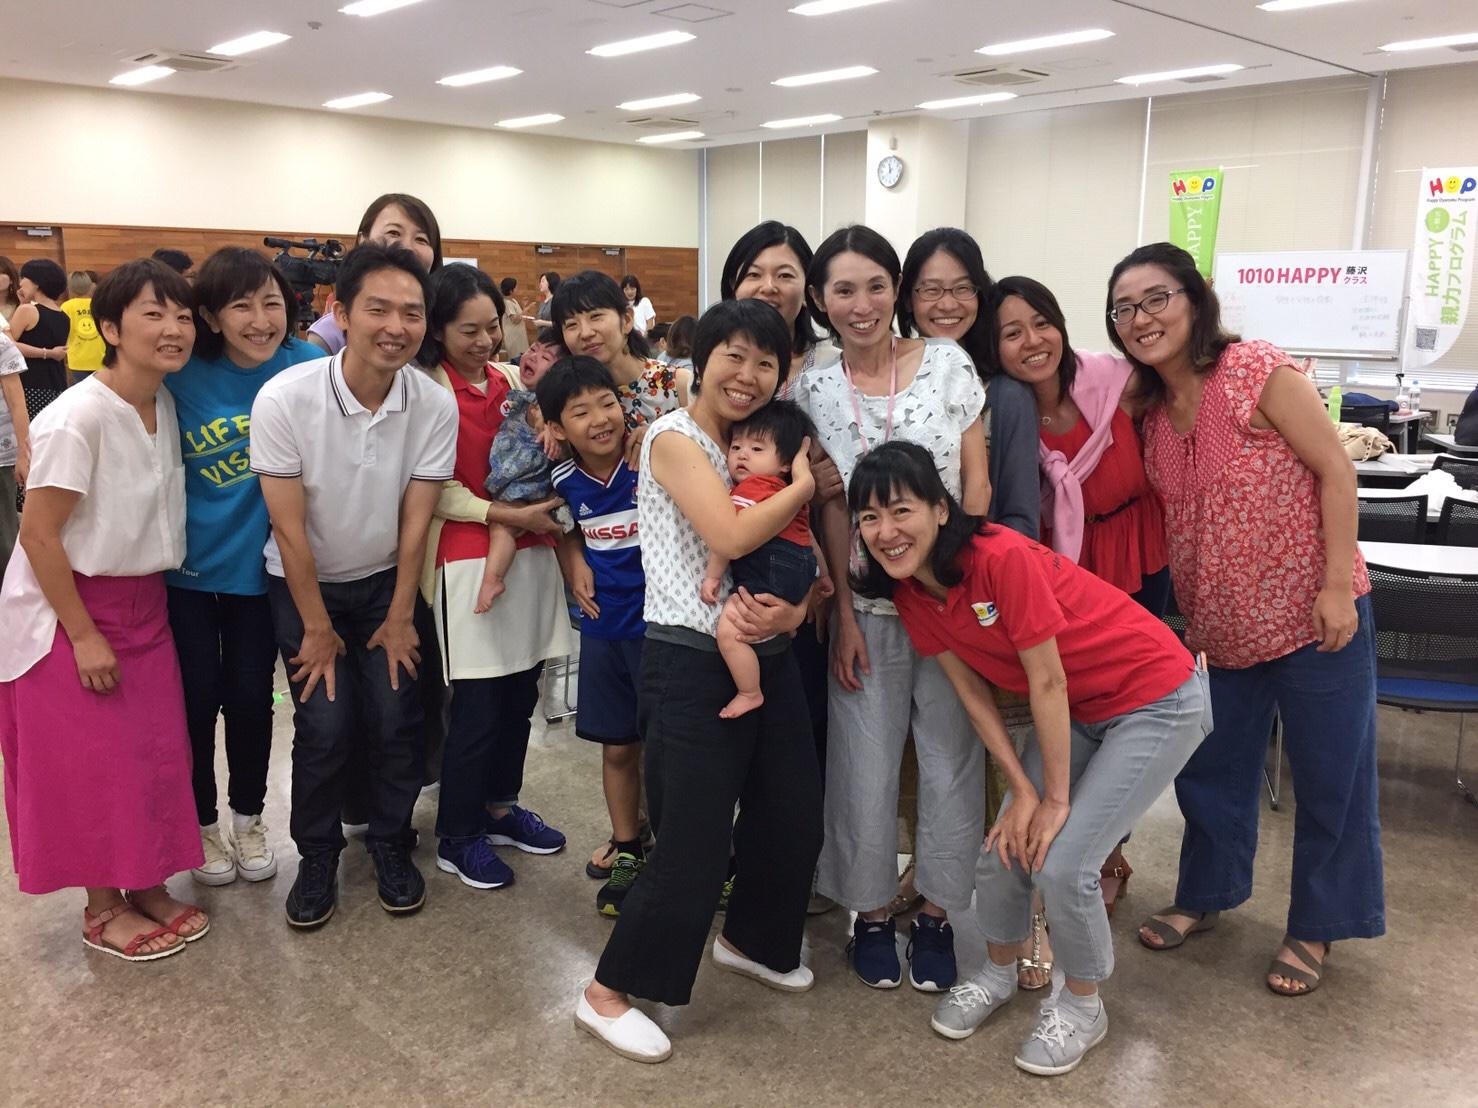 2019/7/30 1010HAPPY藤沢クラス Dグループ